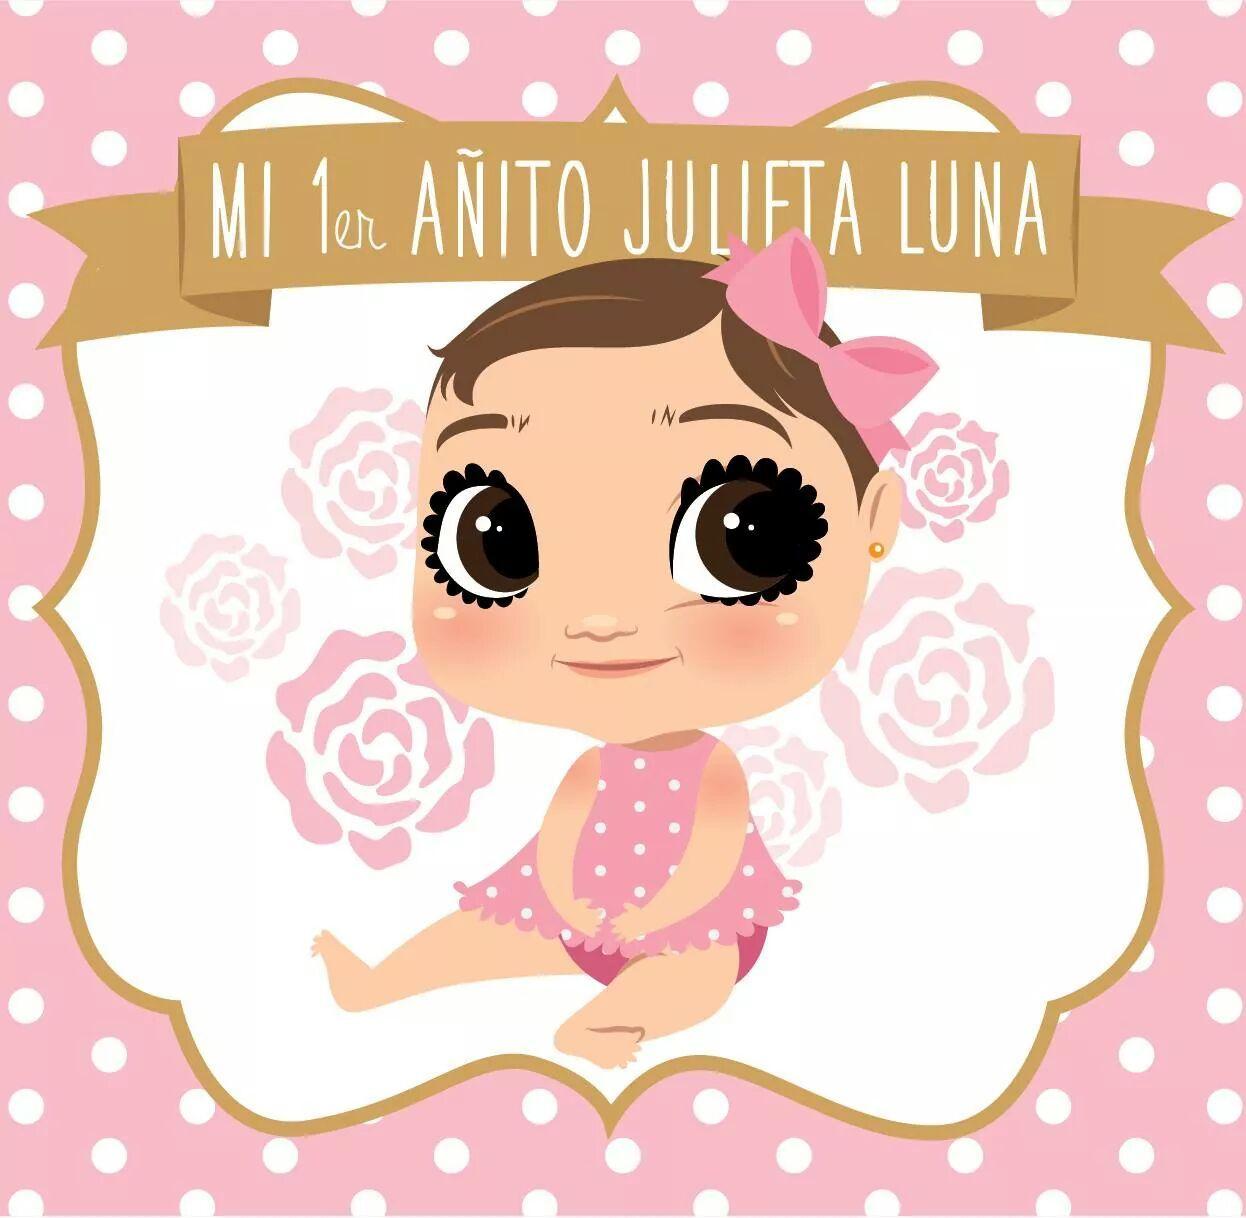 #merylaura #ilustradora #ilustradorescolombianos #artist #illustrator #drawing #draw #illustration #madeincolombia #cute #firstyear #pary #birthday